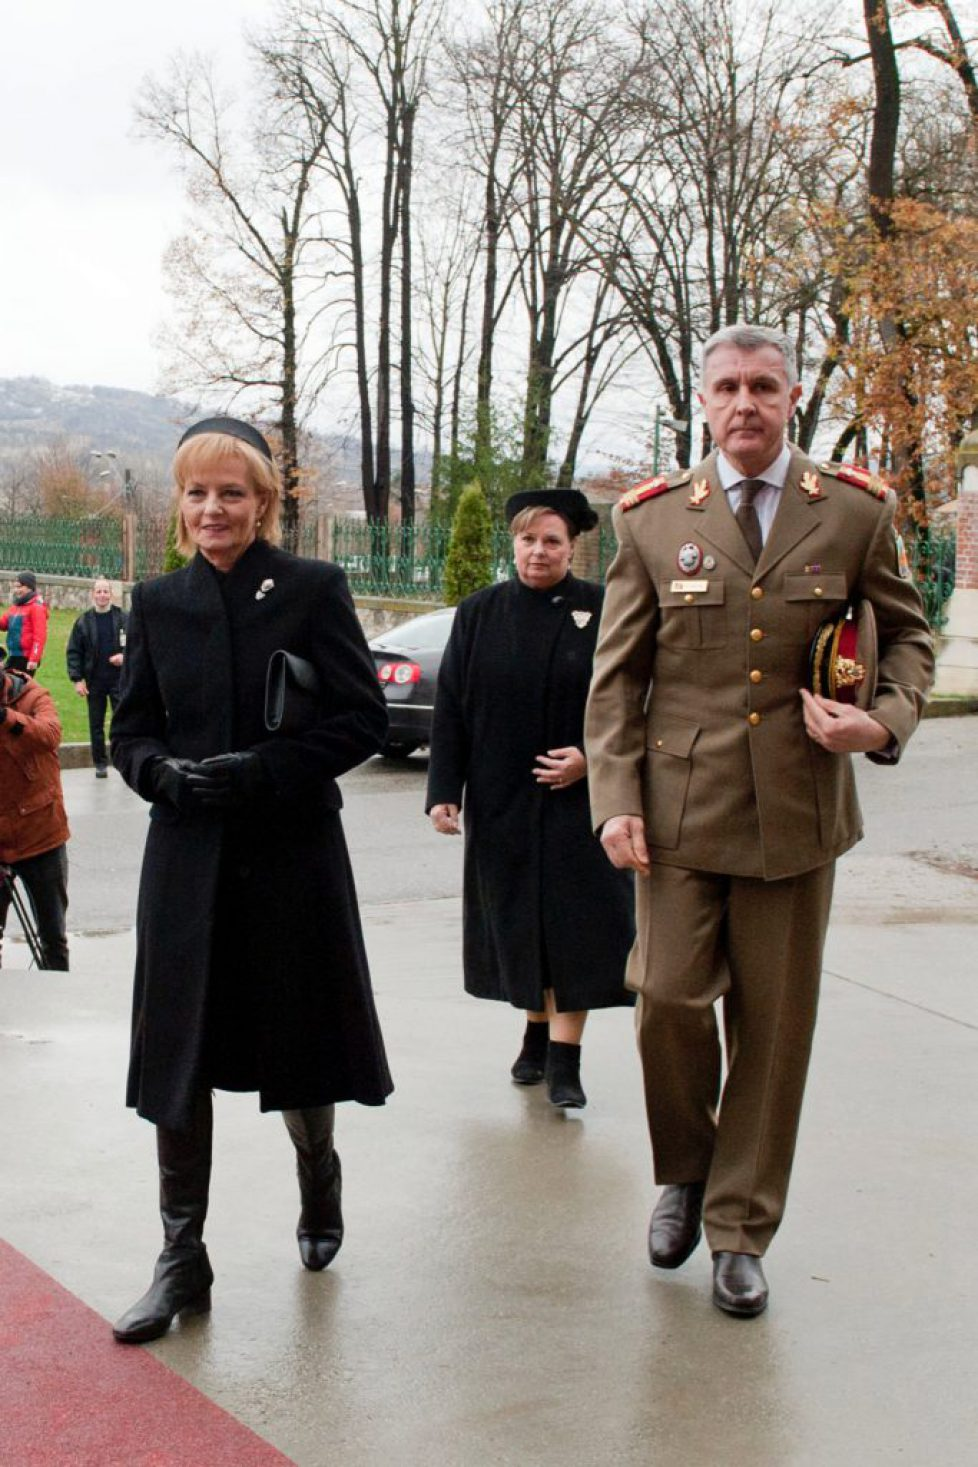 Majestatea-Sa-Margareta-Principele-Radu-Principesa-Sofia-Curtea-de-Arges-parastas-2-ani-Regele-Mihai-I_ANG3088